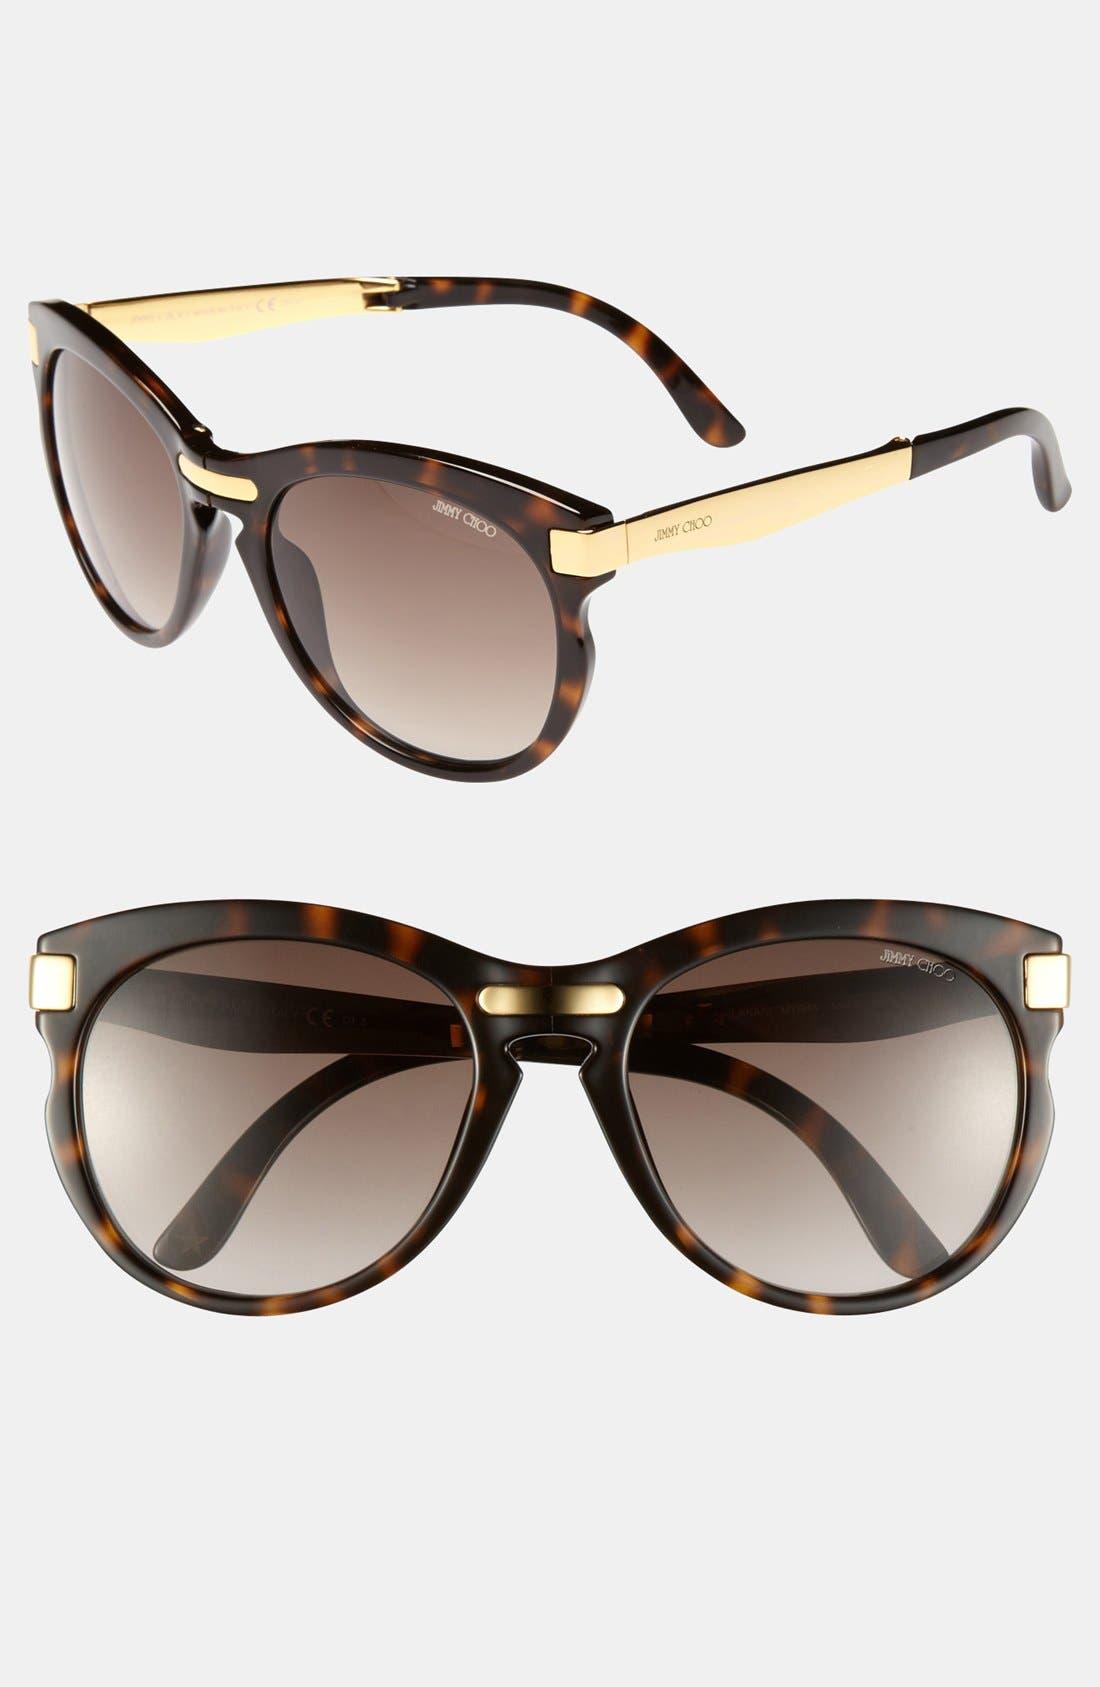 Main Image - Jimmy Choo 'Lanas' 55mm Sunglasses